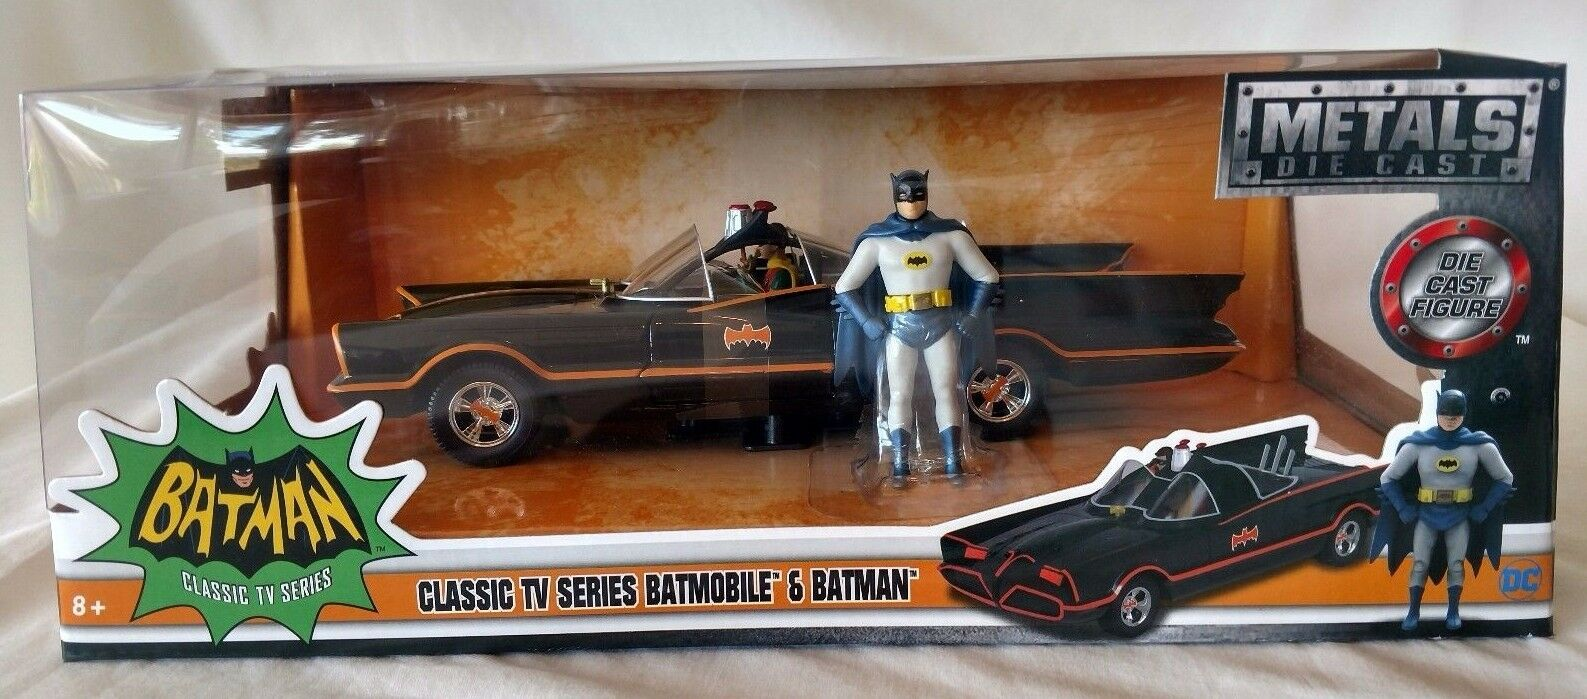 JADA TOYS BATMAN CLASSIC TV SERIES 1966 BATMAN & BATMOBILE 2016